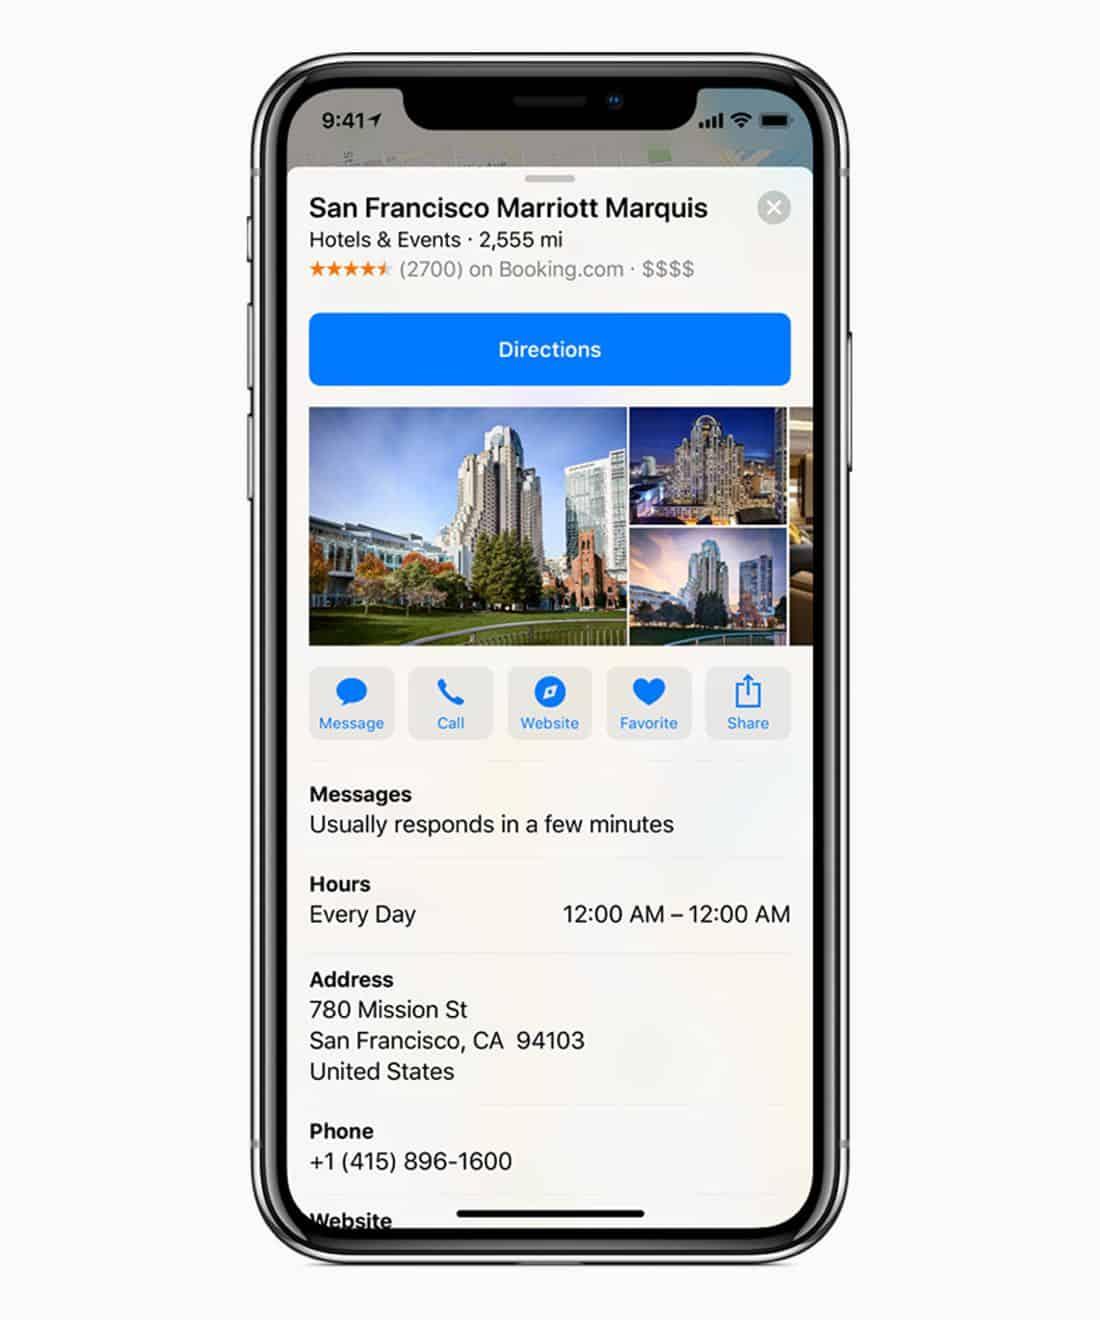 iOS 11.3 business maps screen 03292018